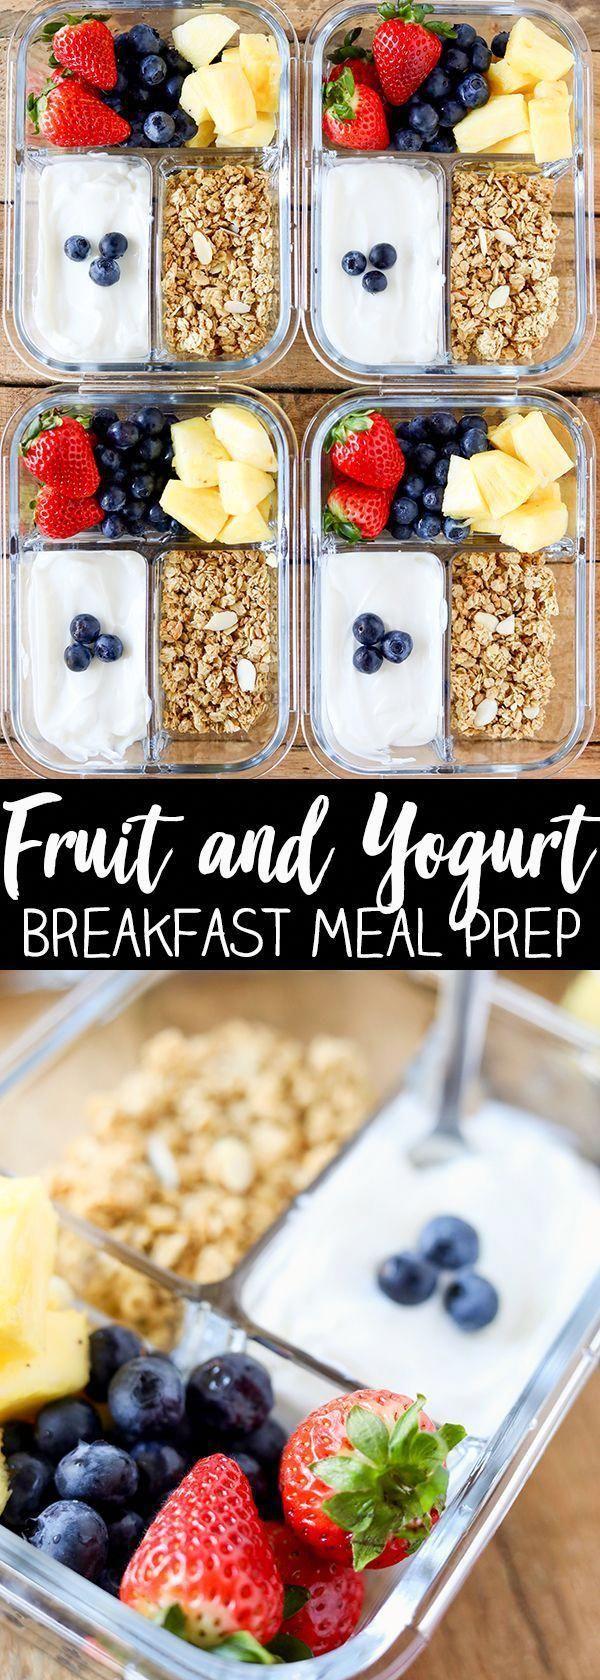 Breakfast Meal Prep Fruit and Yogurt Bistro Box #healthyrecipes